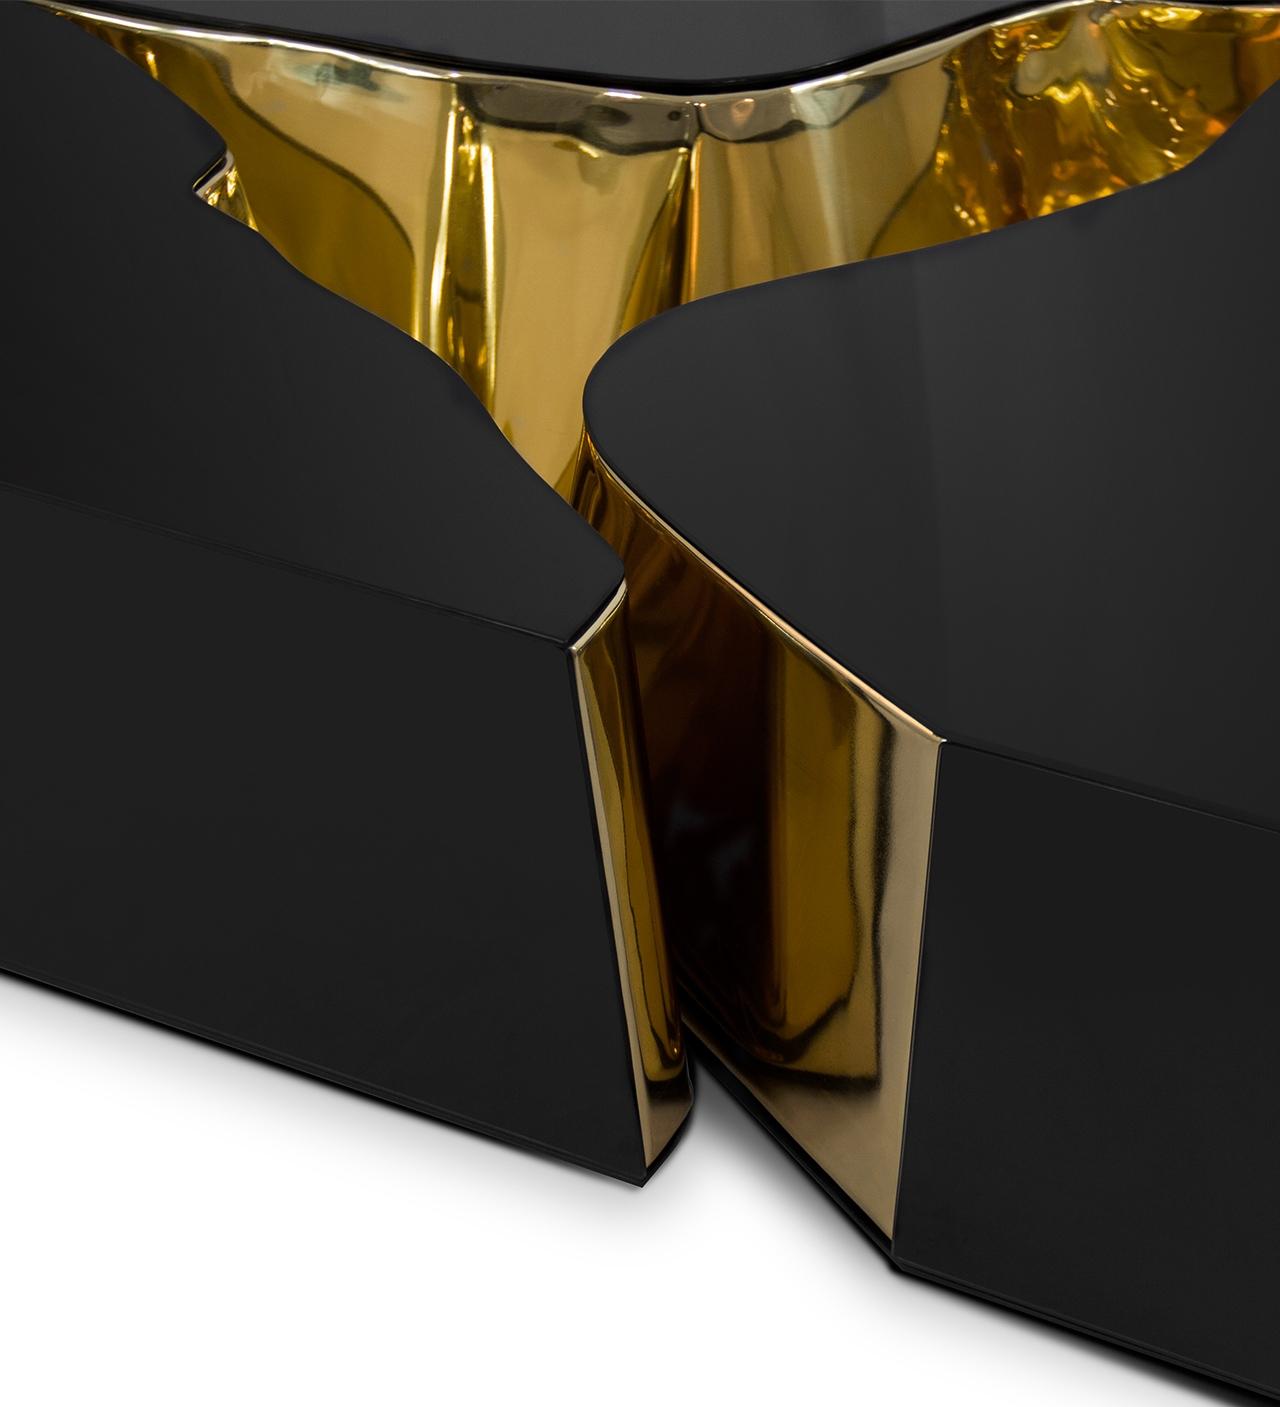 Luxus Mobel Modern Serie Lapiaz